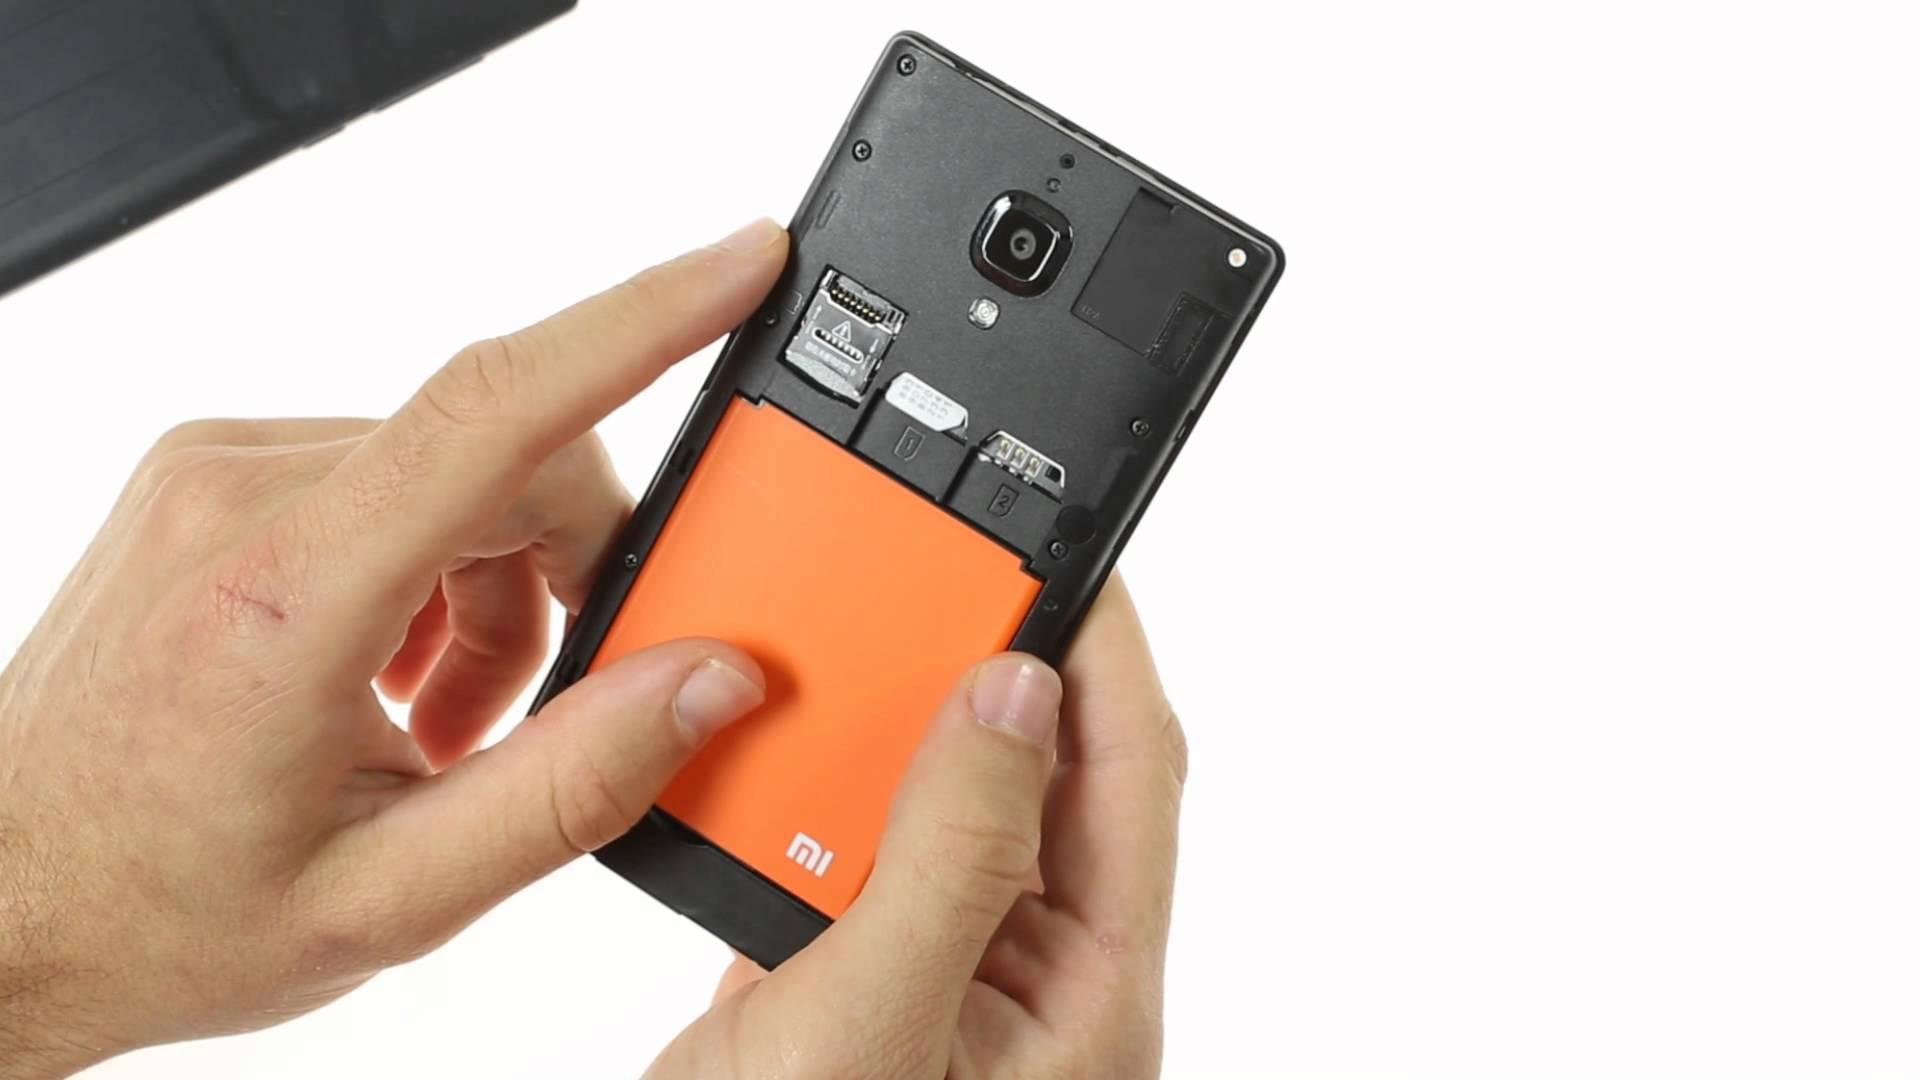 Xiaomi Redmi 1S: